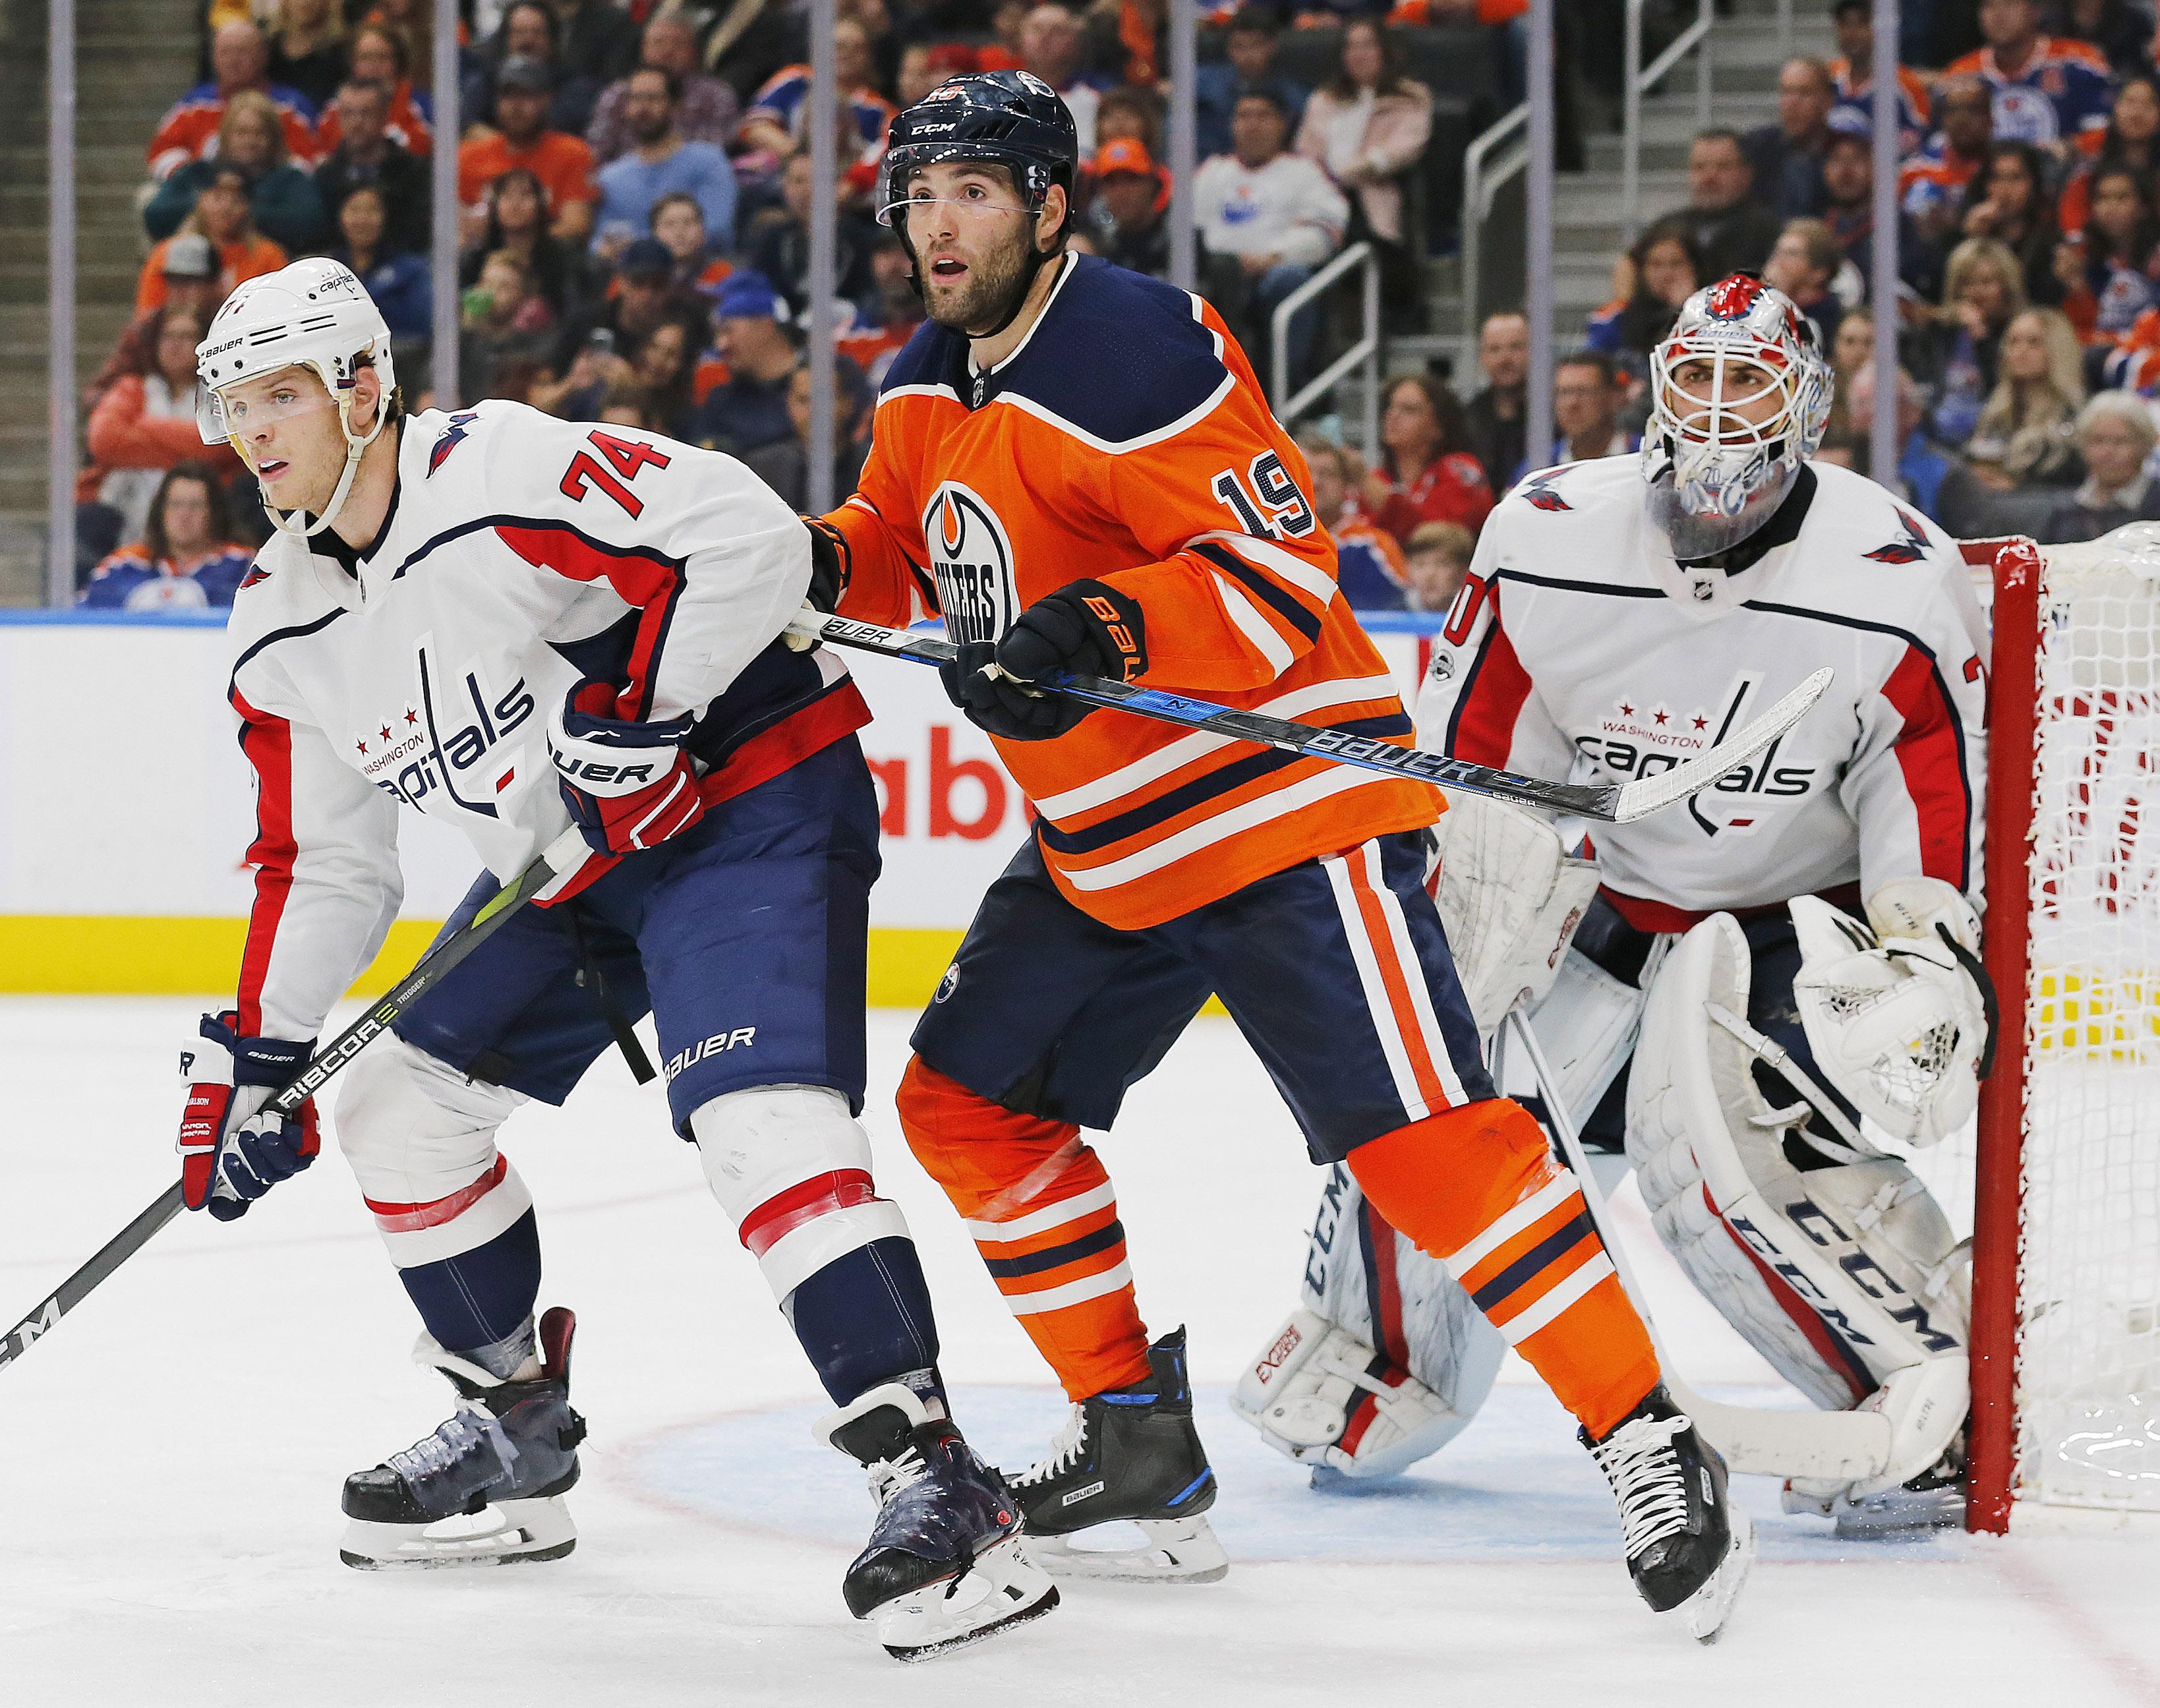 NHL: Washington Capitals at Edmonton Oilers